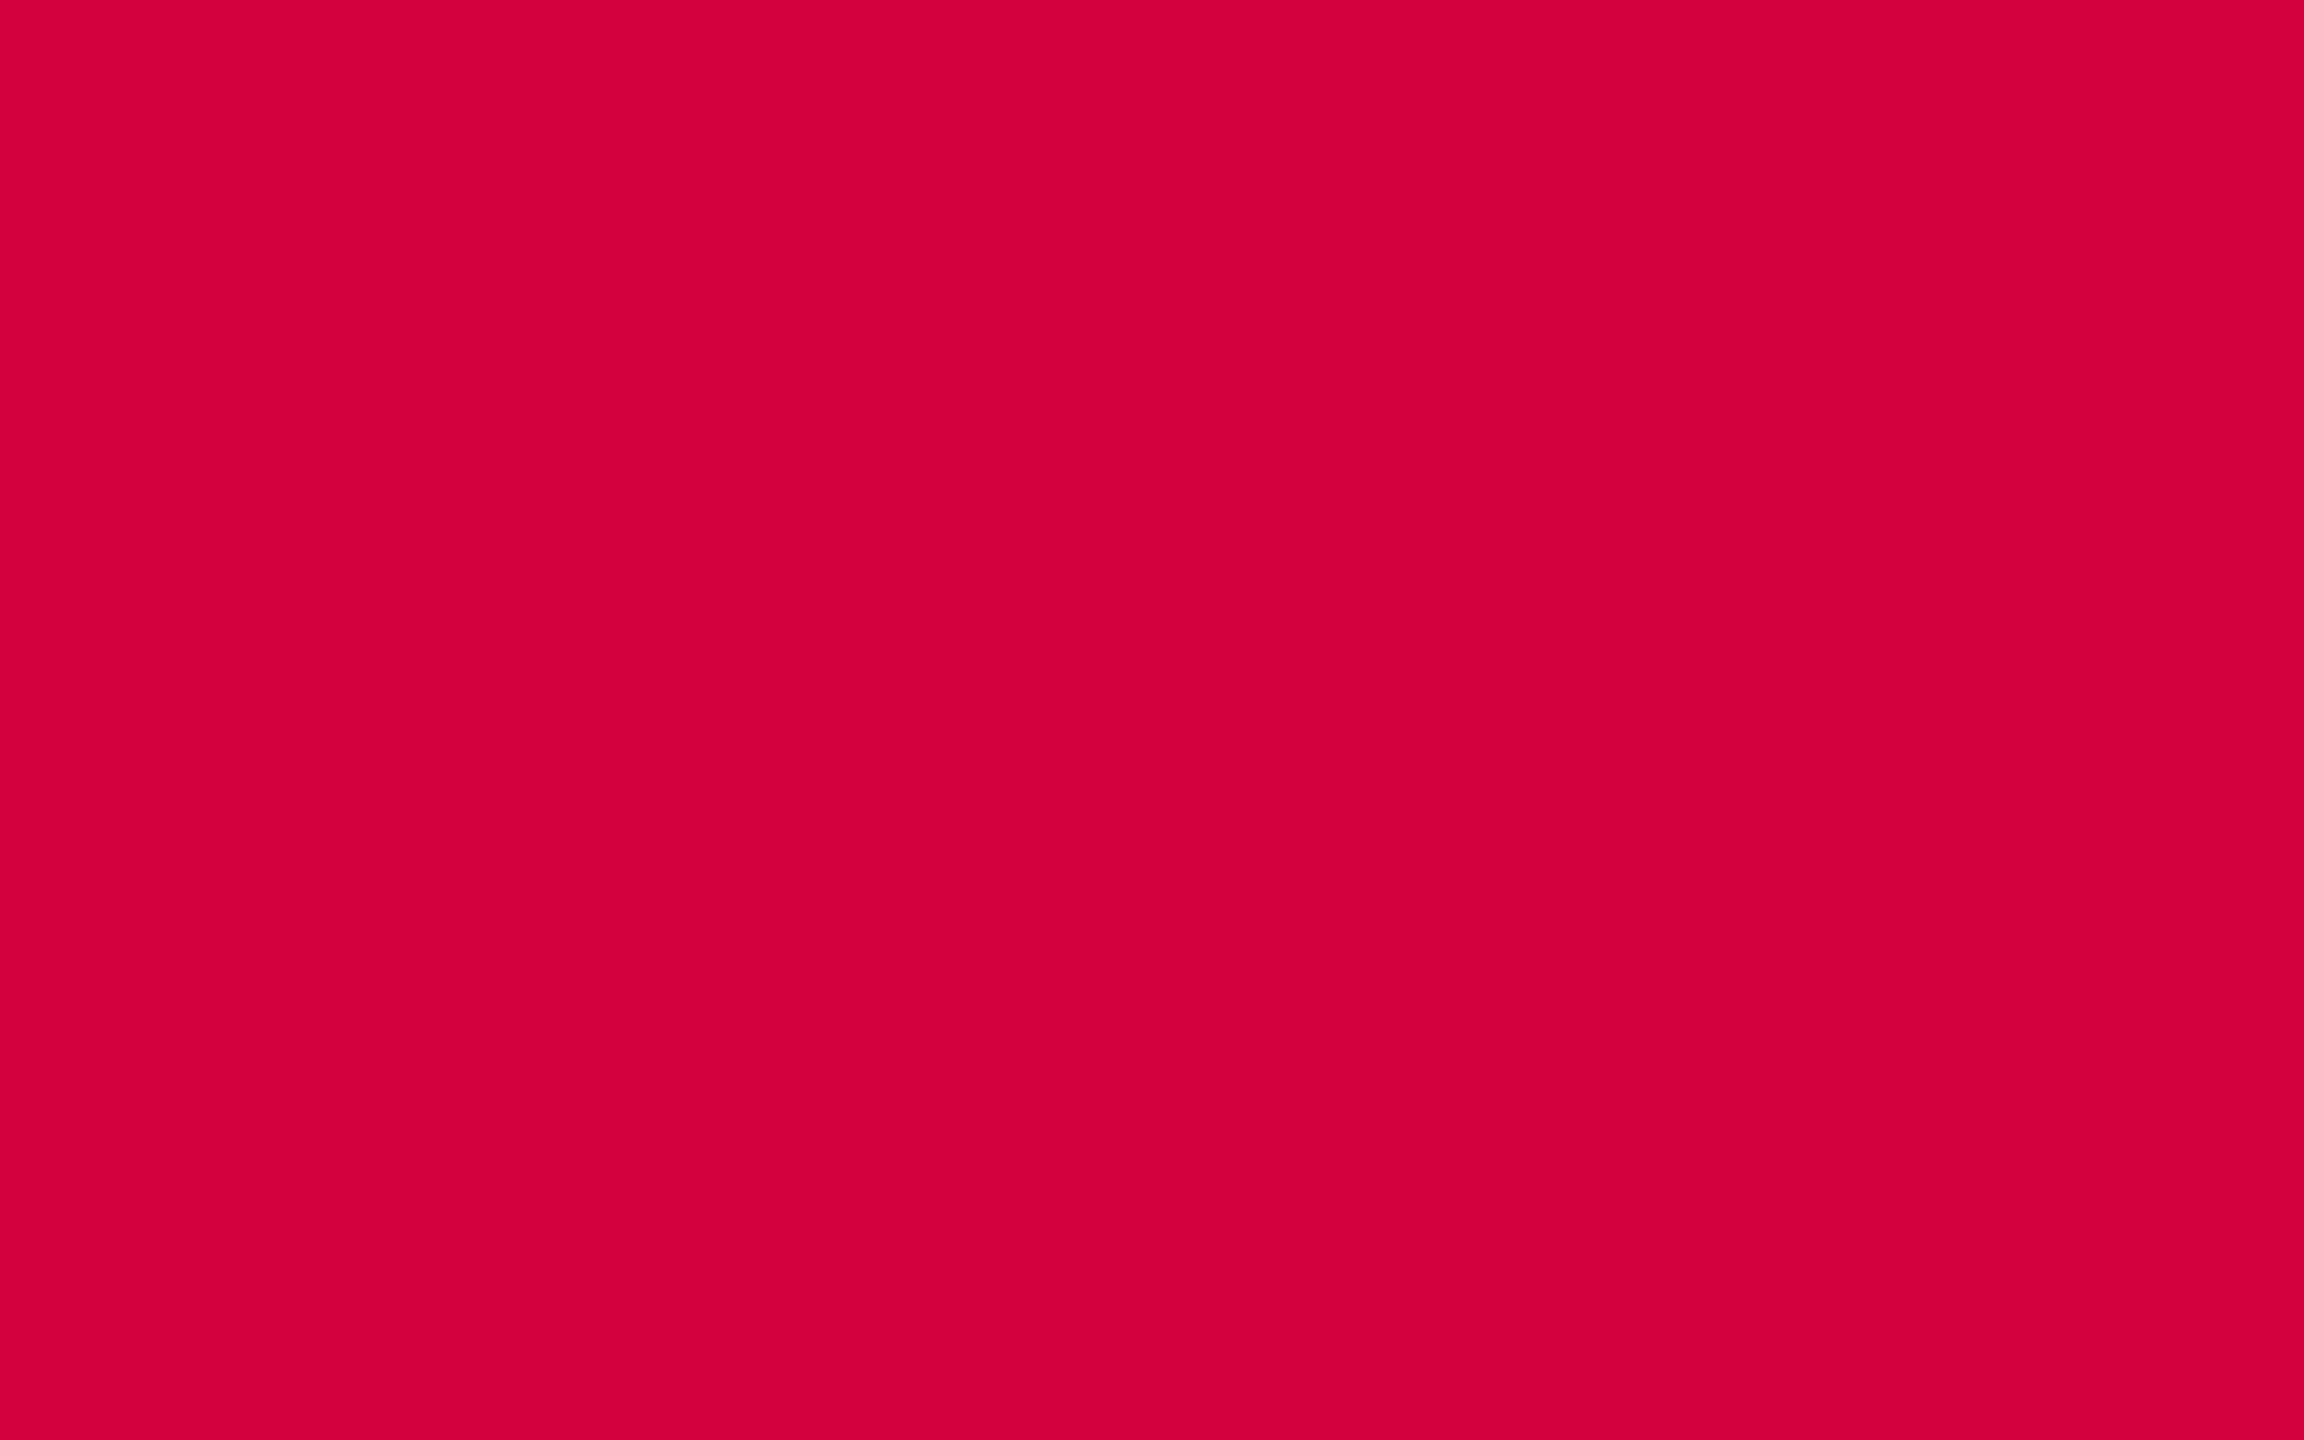 2304x1440 Utah Crimson Solid Color Background